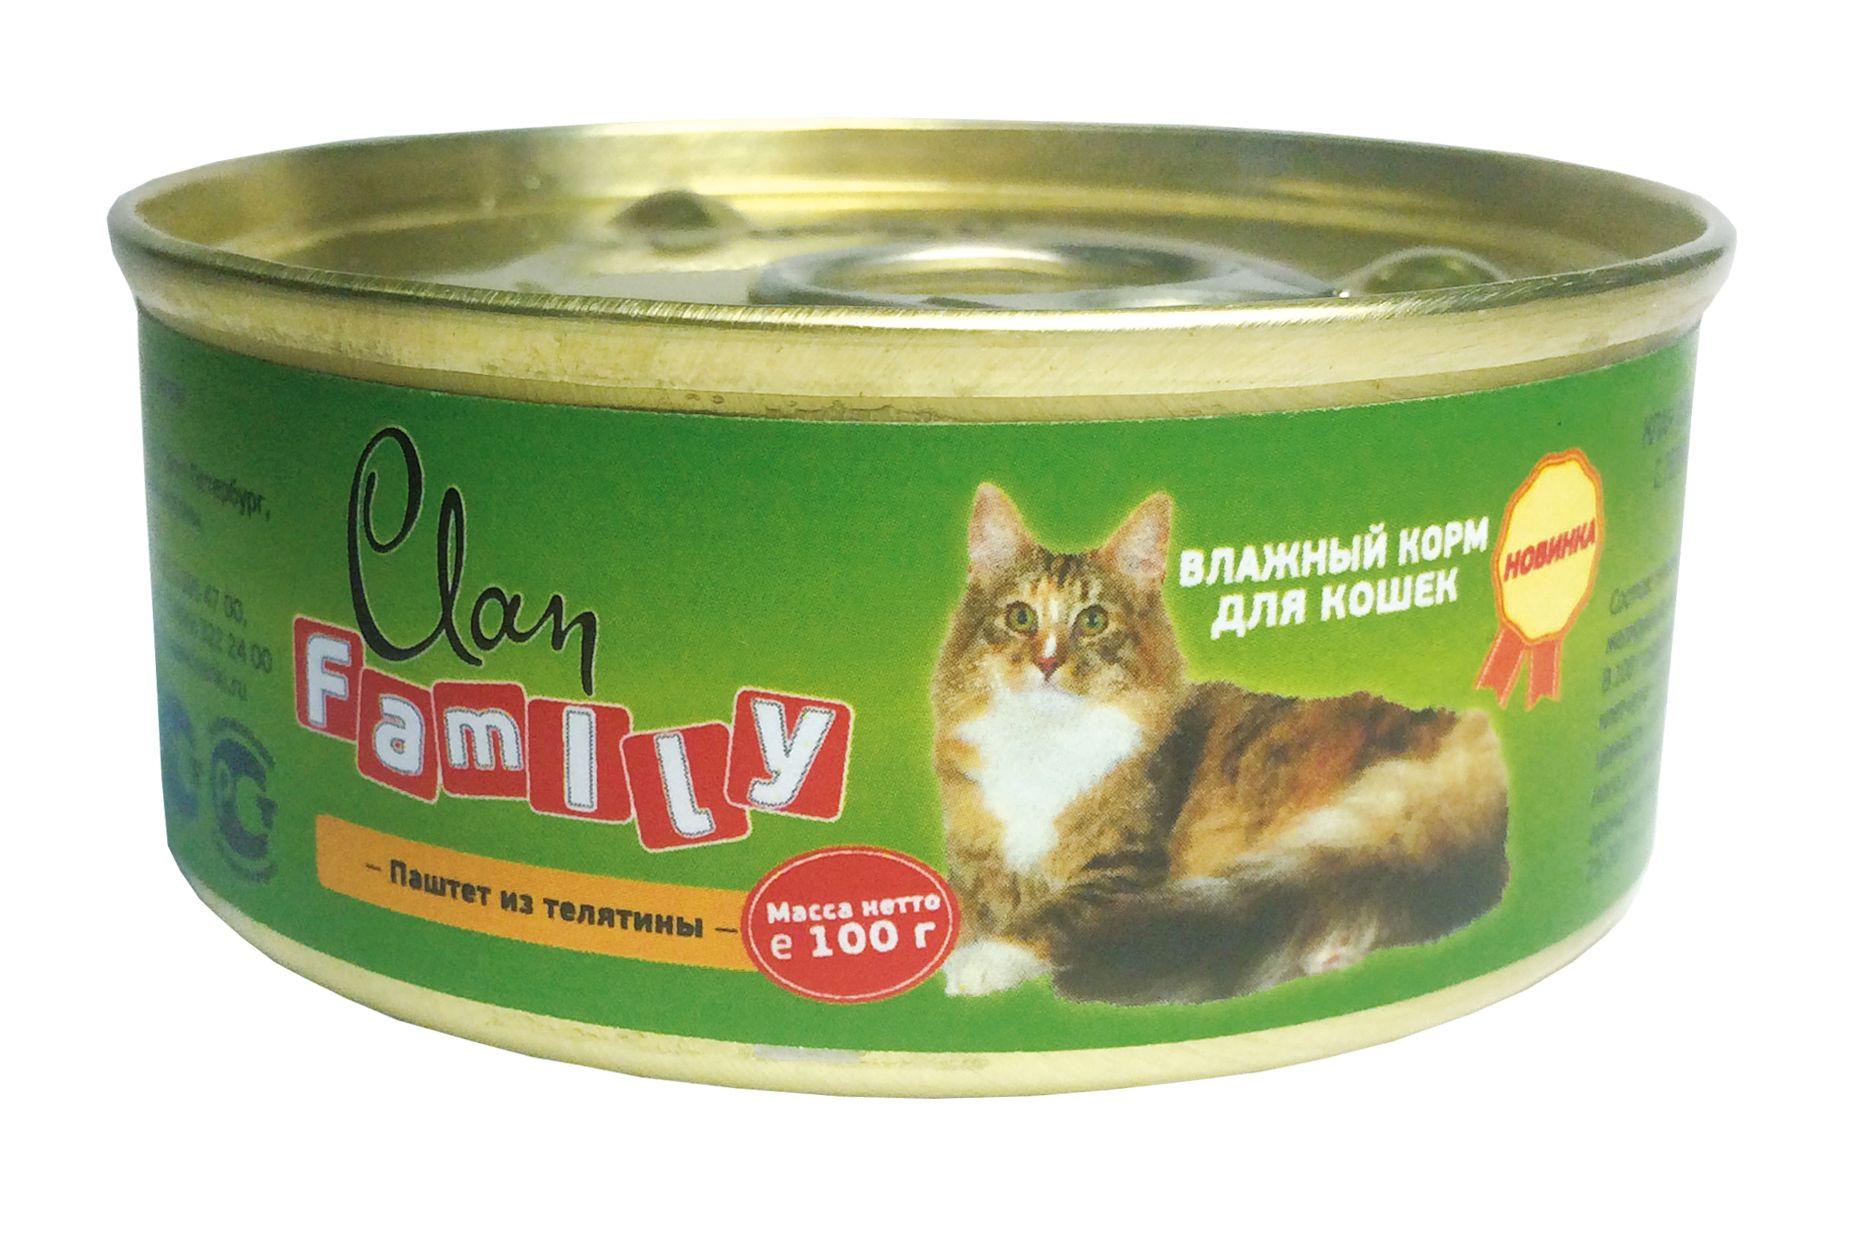 Консервы для кошек Clan Family, телятина, 100г